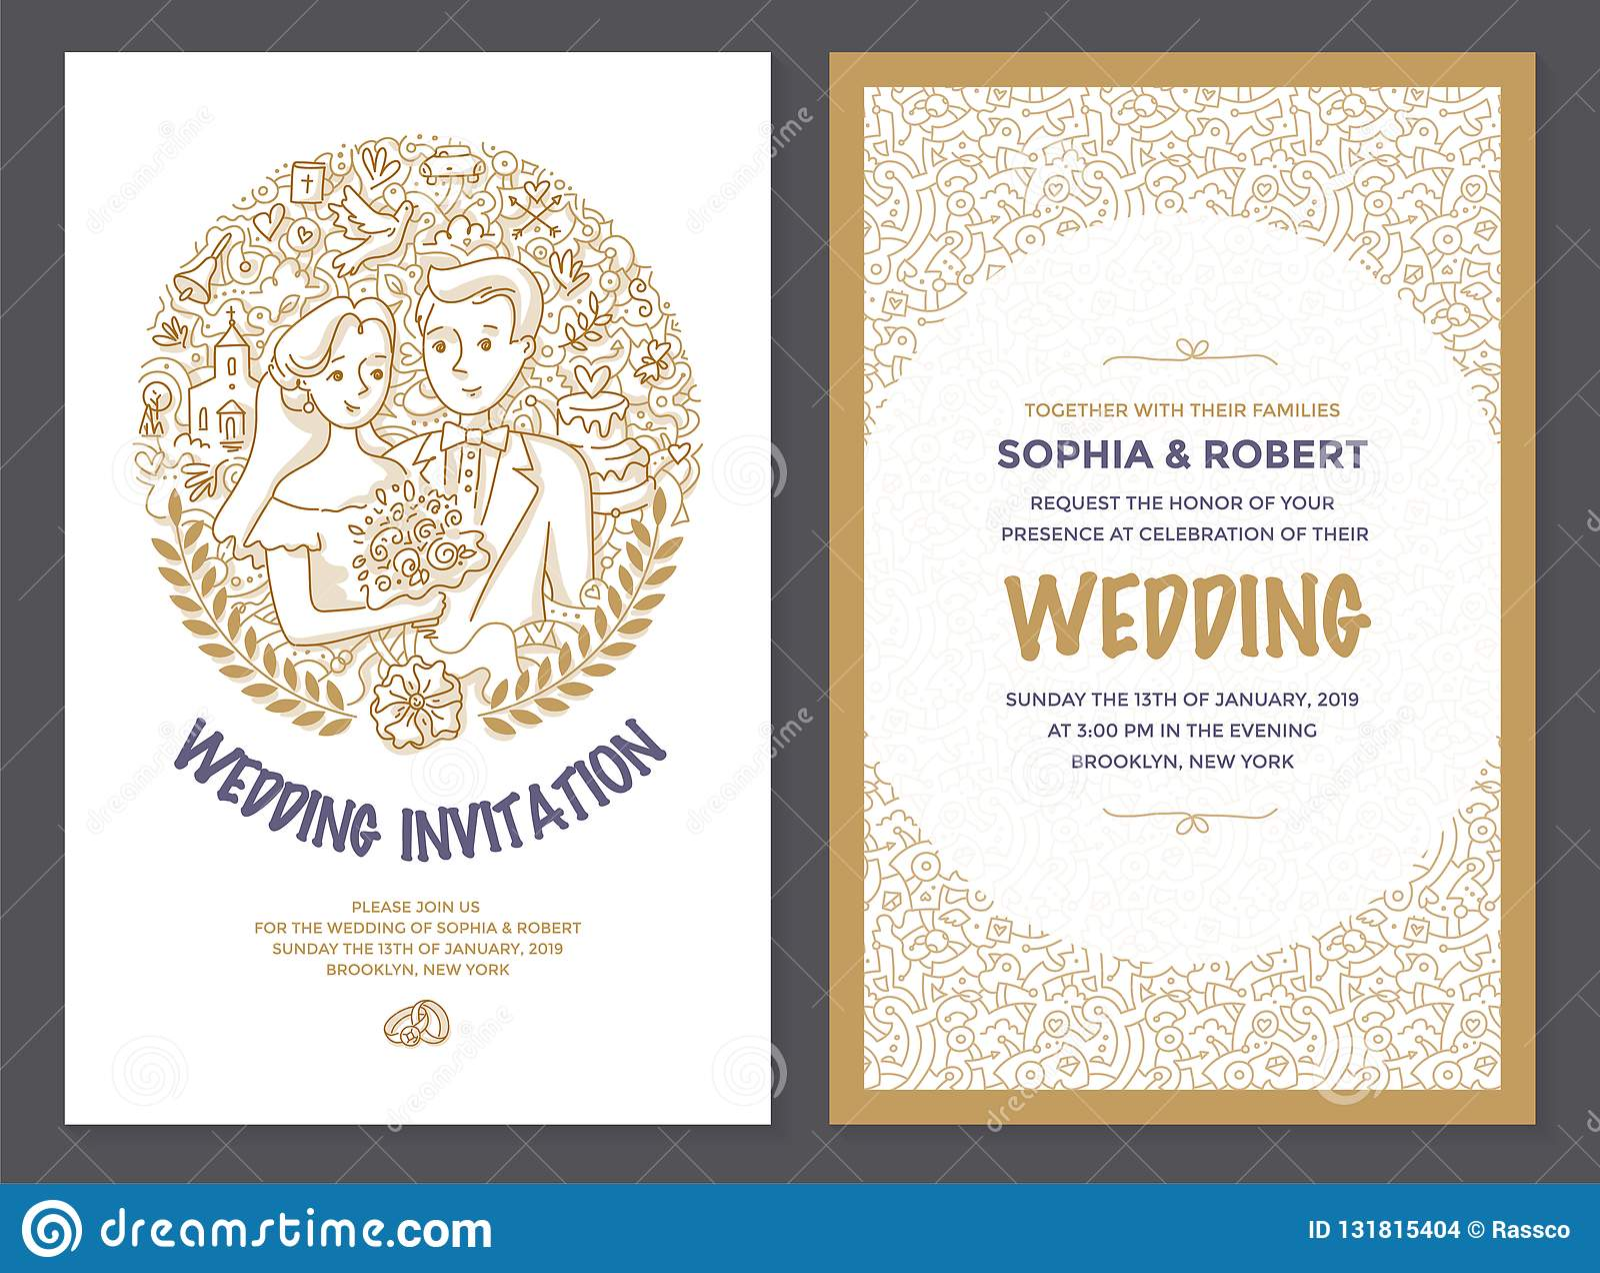 Wedding Invitation Doodle Card Stock Vector - Illustration of card